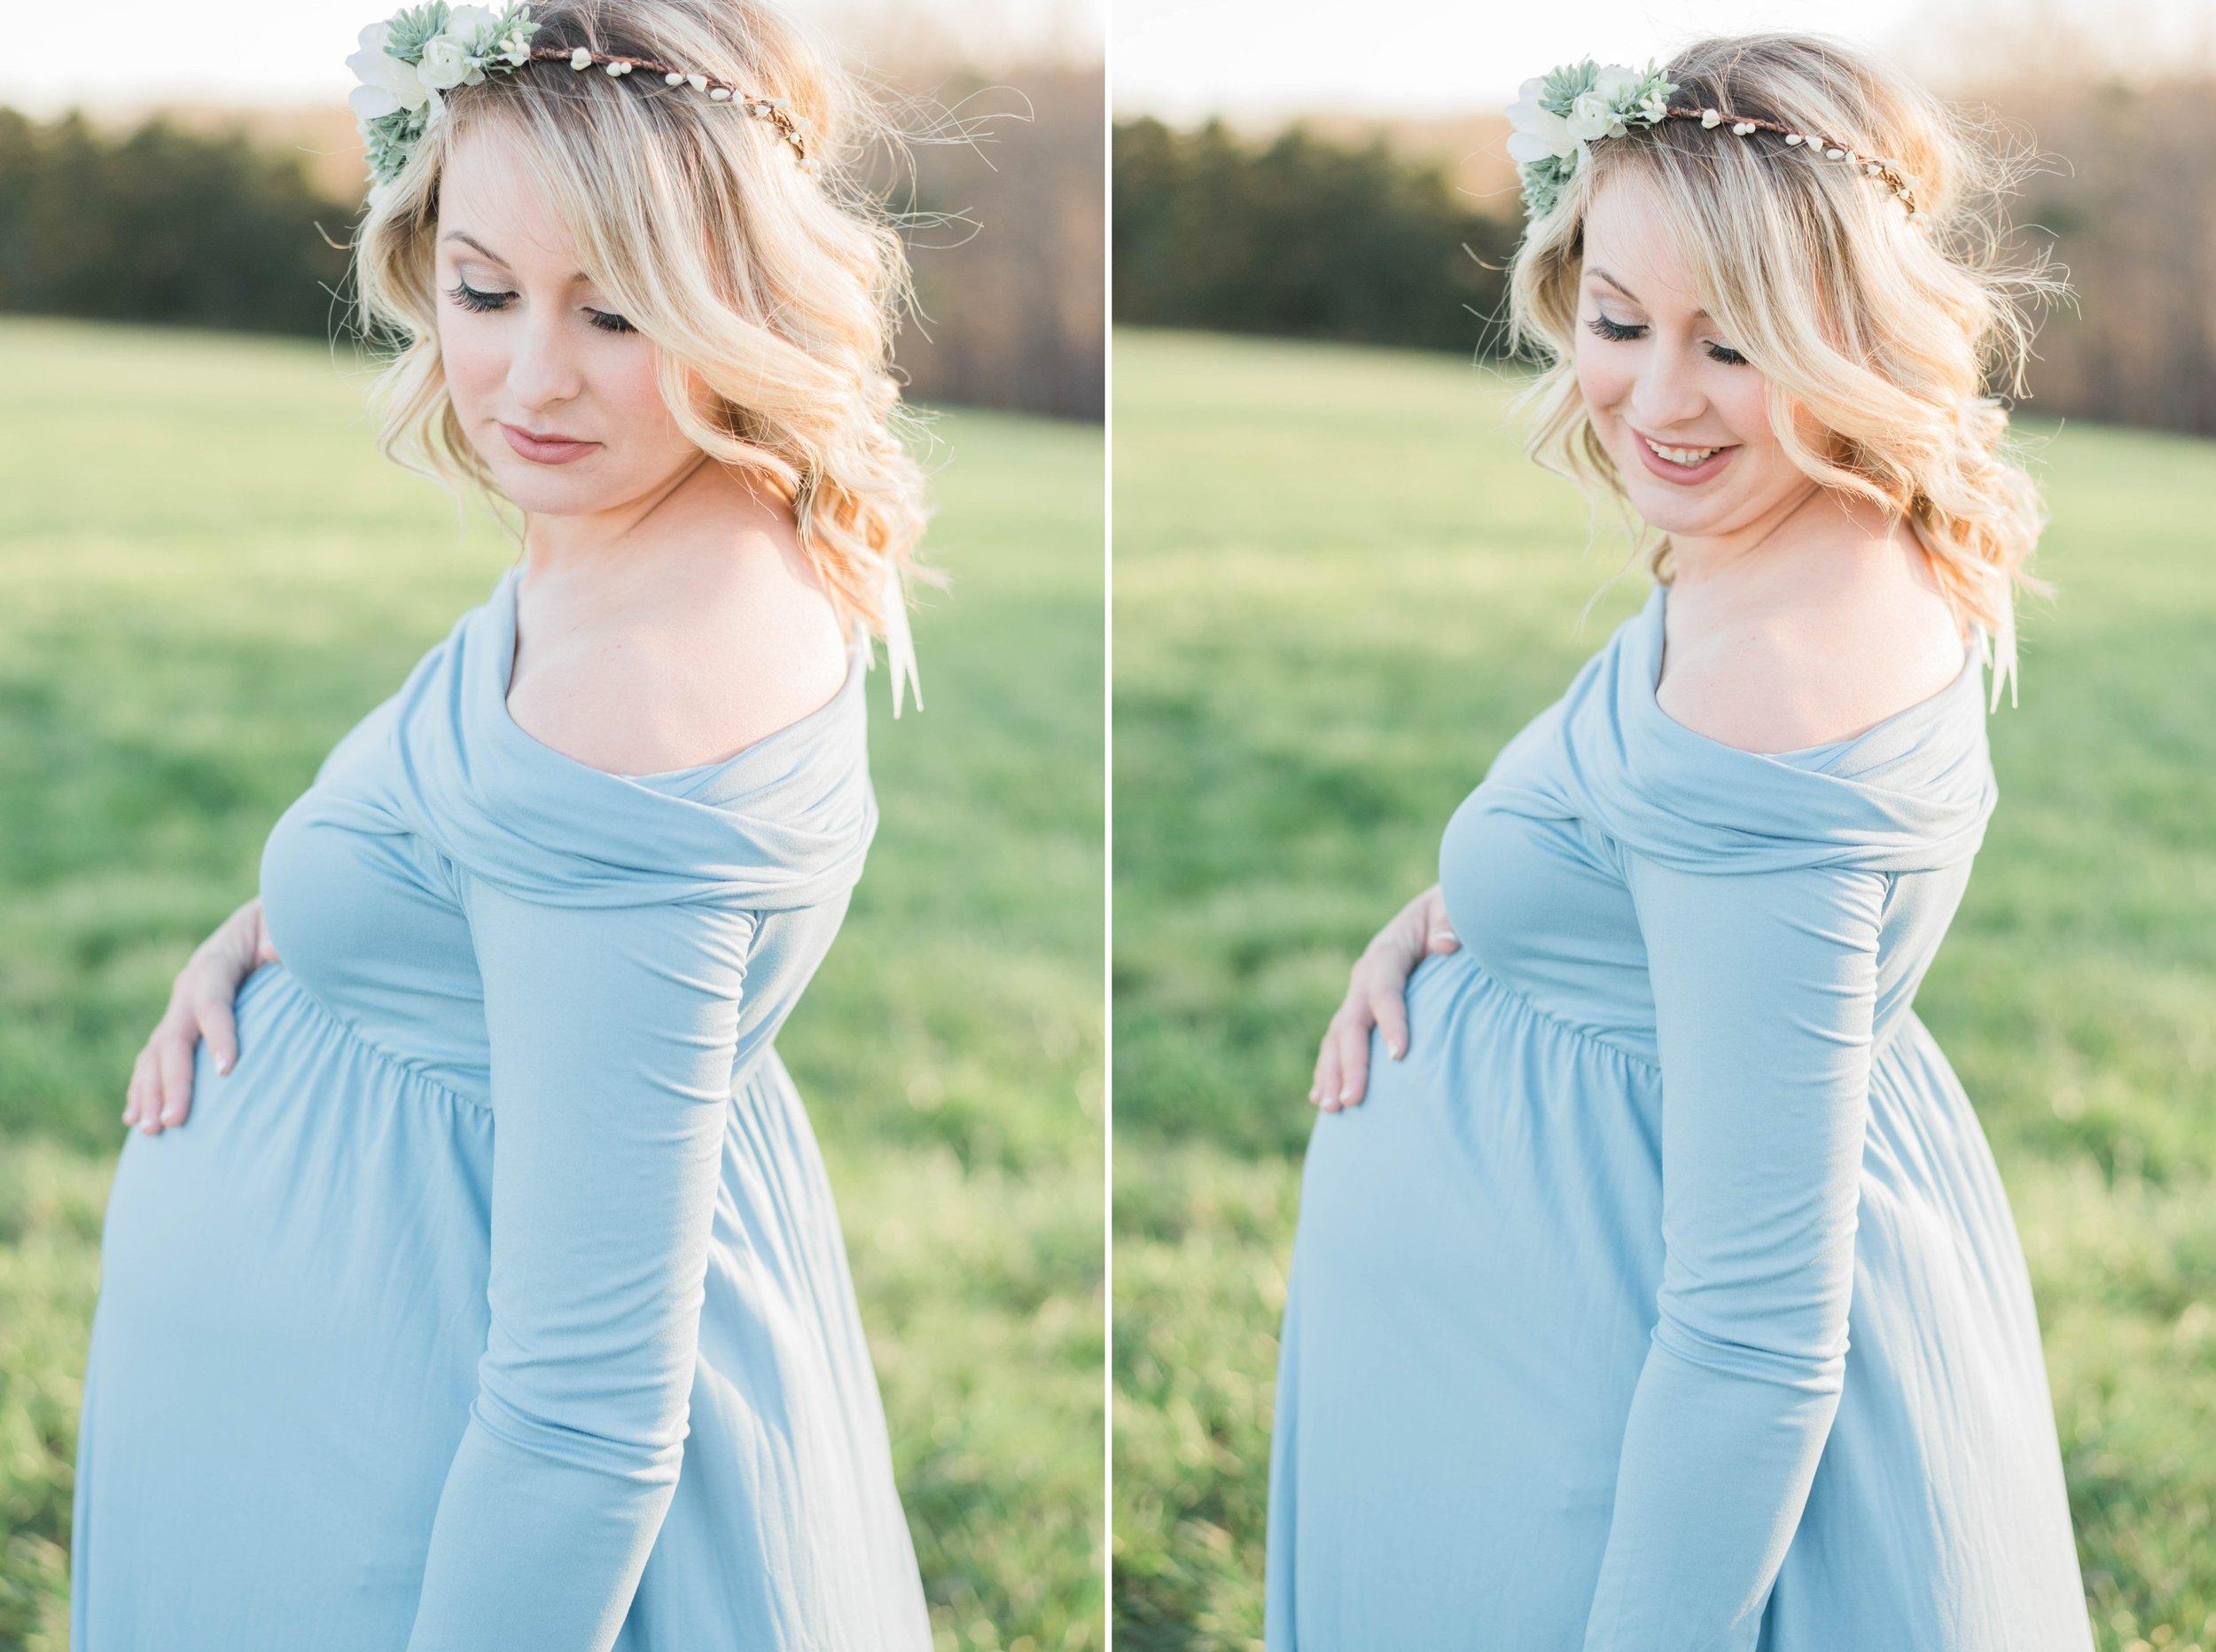 SorellaFarms_Jessica+Dylan_MaternitySession_Virginiaweddingphotographer 37.jpg